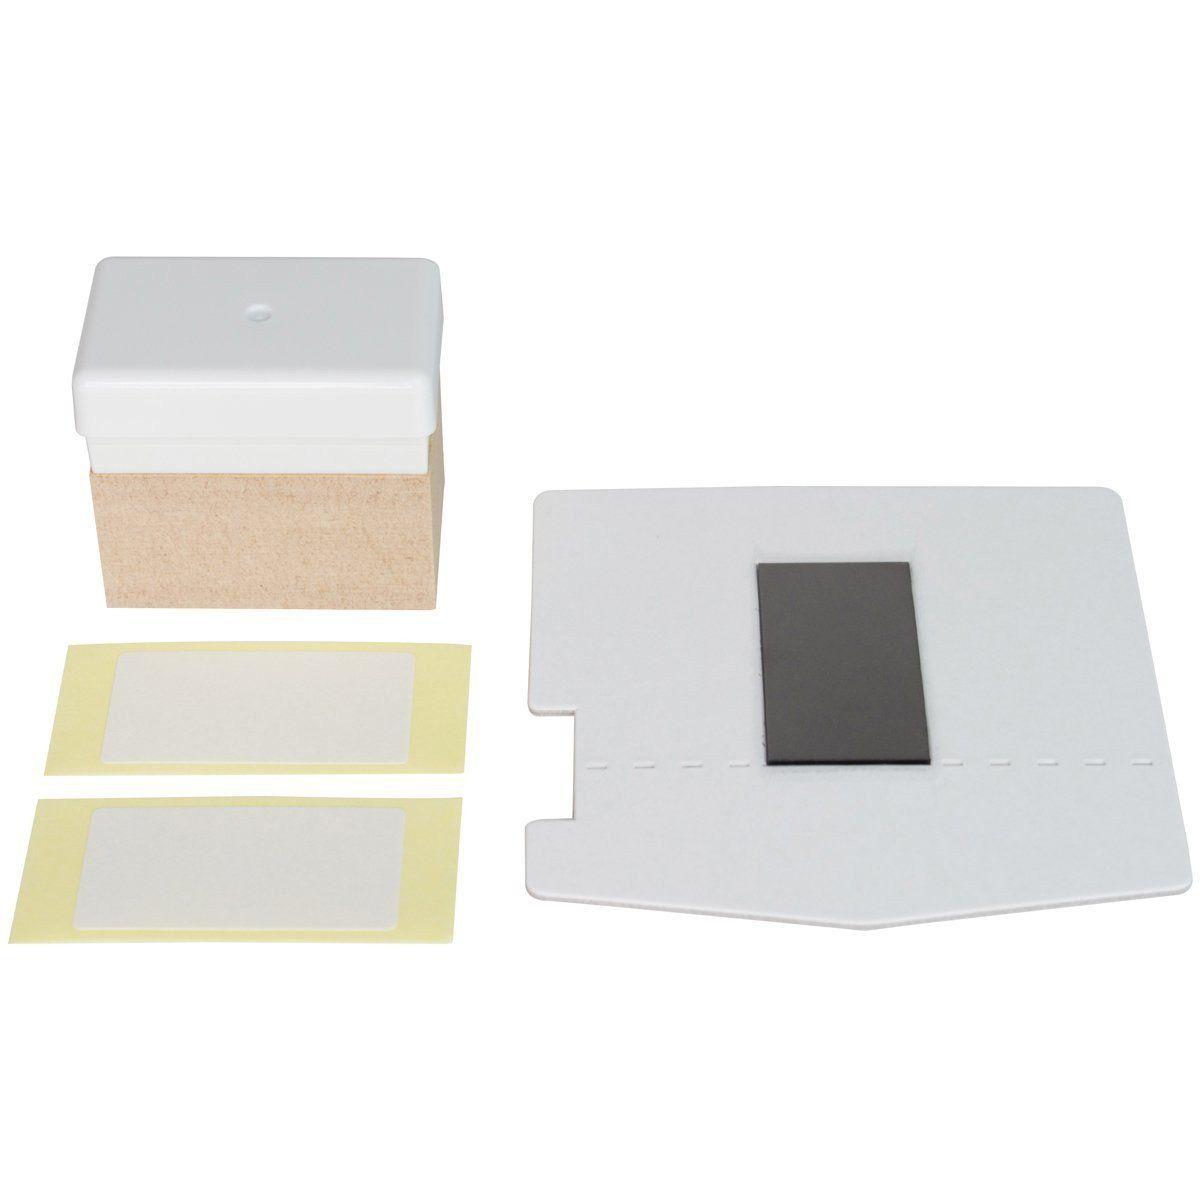 Silhouette Mint Stamp Kit 30 mm x 60 mm